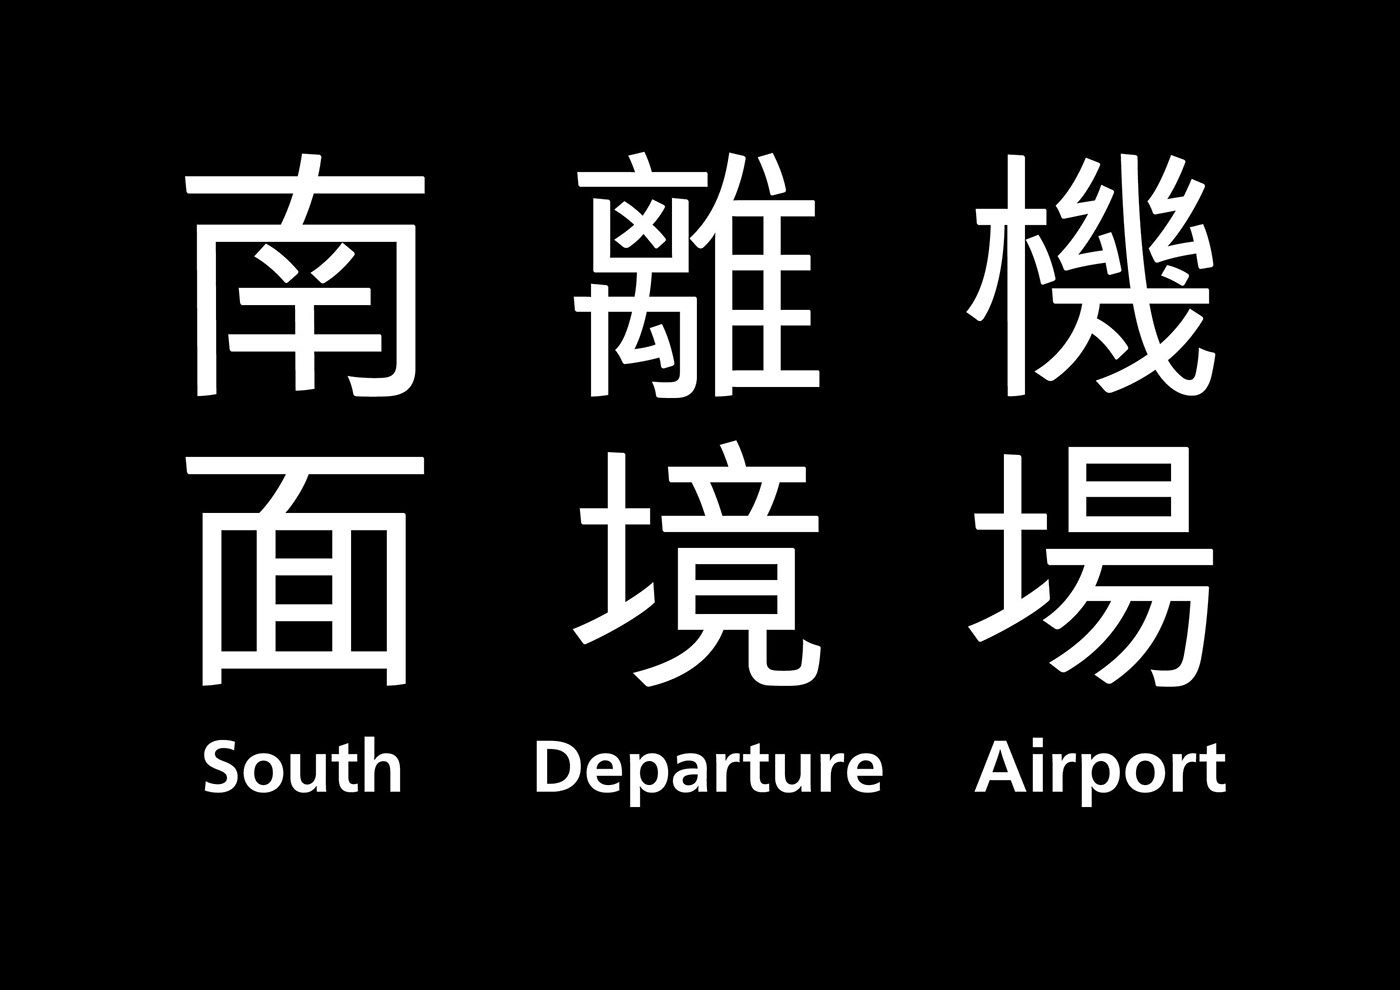 Typeface chinese typeface typography   airport Signage wayfinding type design sanserif Chinese typography glyphs